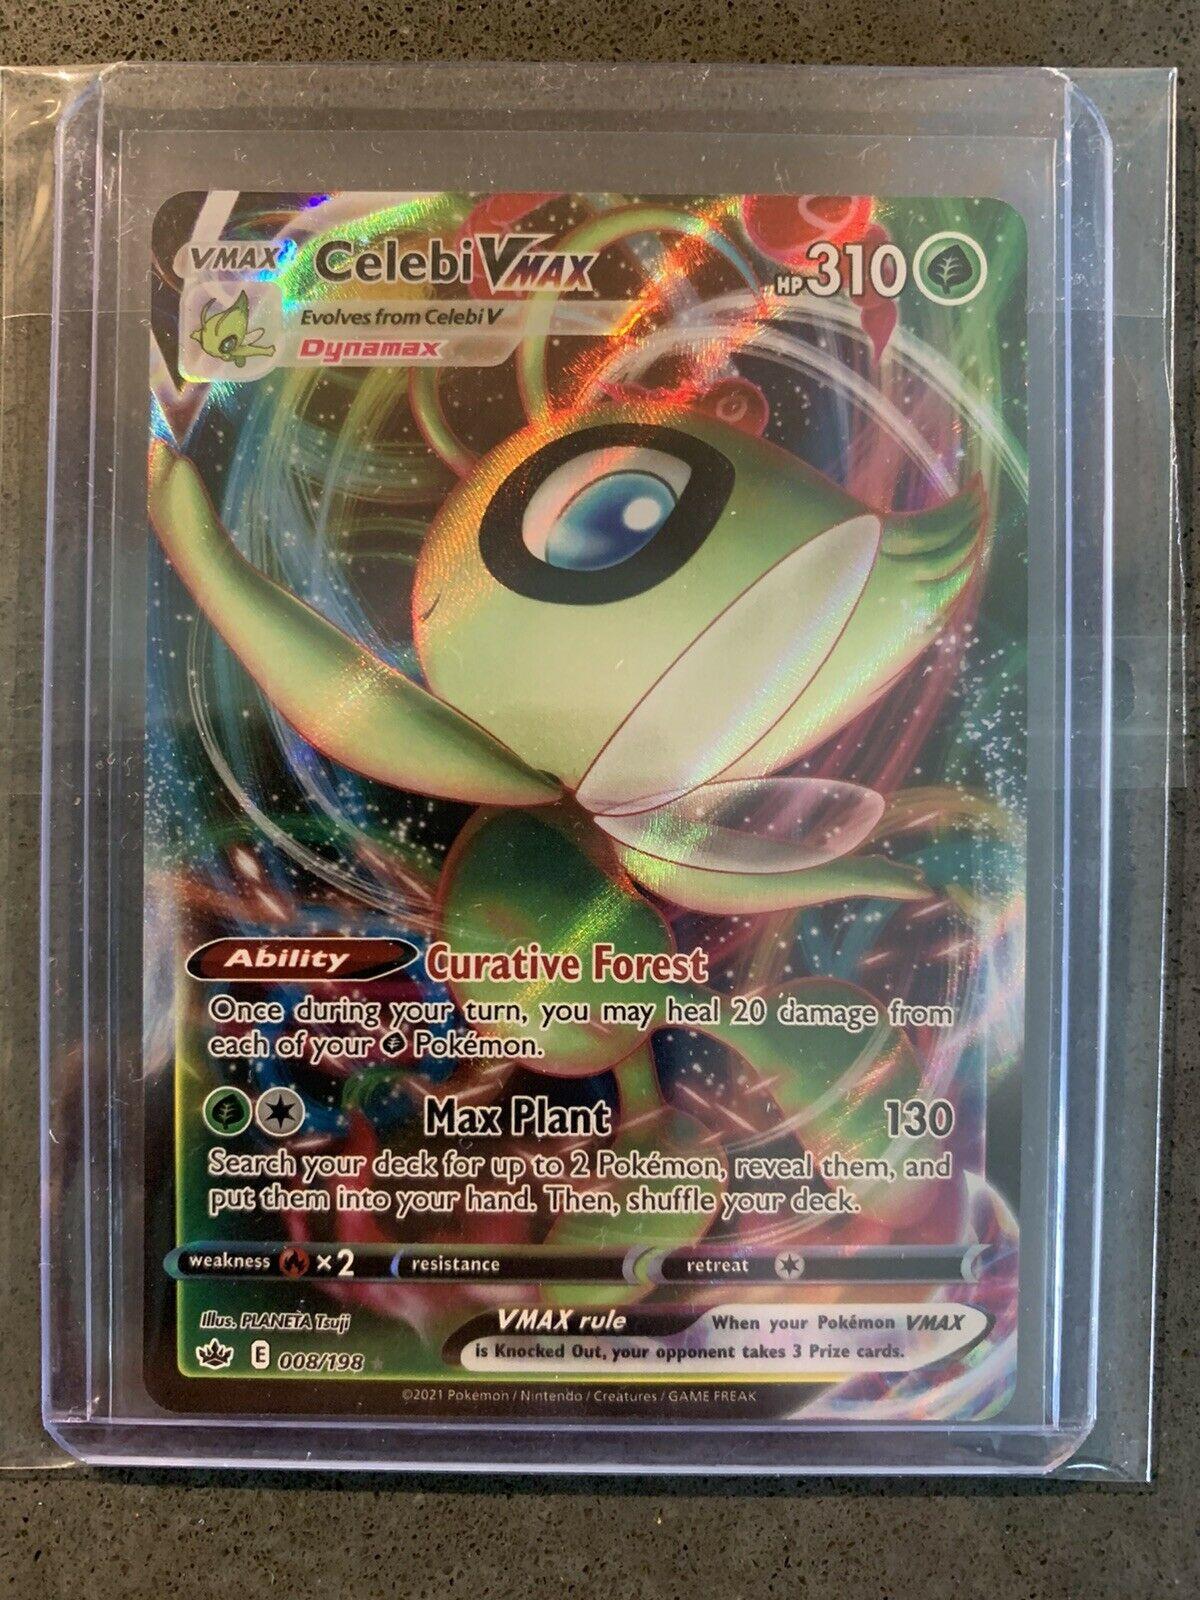 Celebi VMAX - 008/198 - Chilling Reign - Pokémon TCG - PSA 10 ?